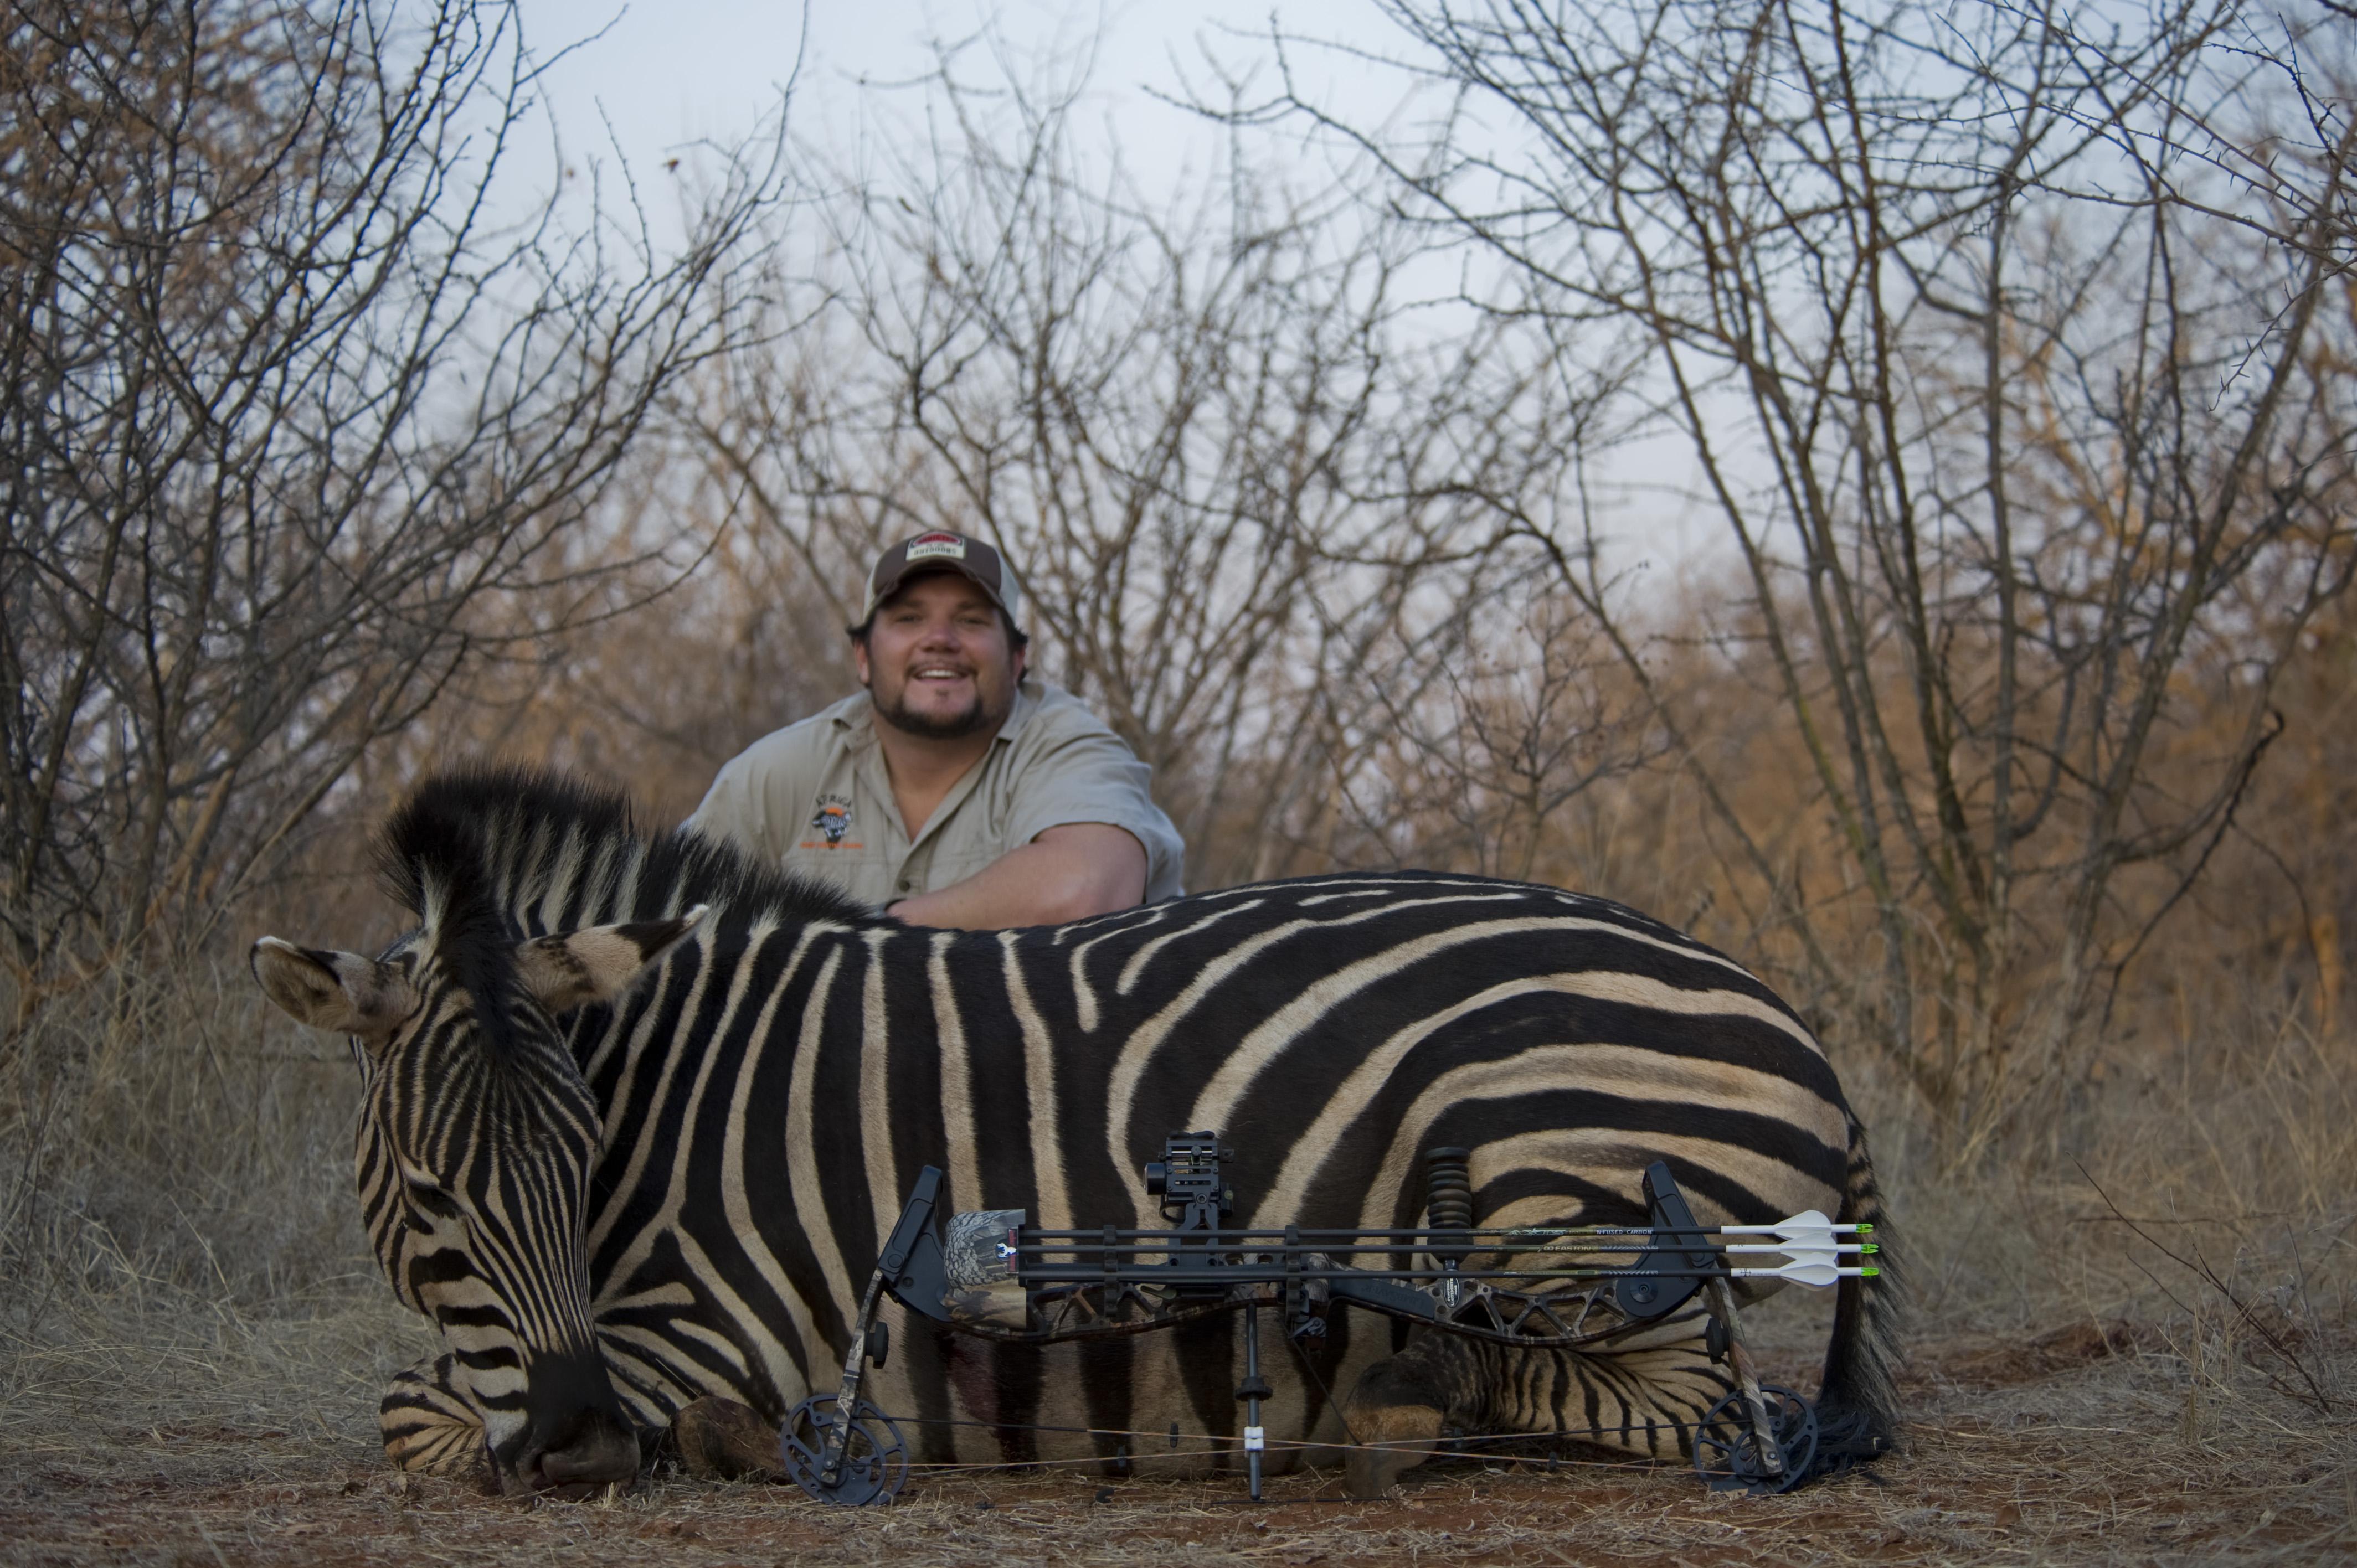 ATTO-S05-Africa-Jon-Zebra-001